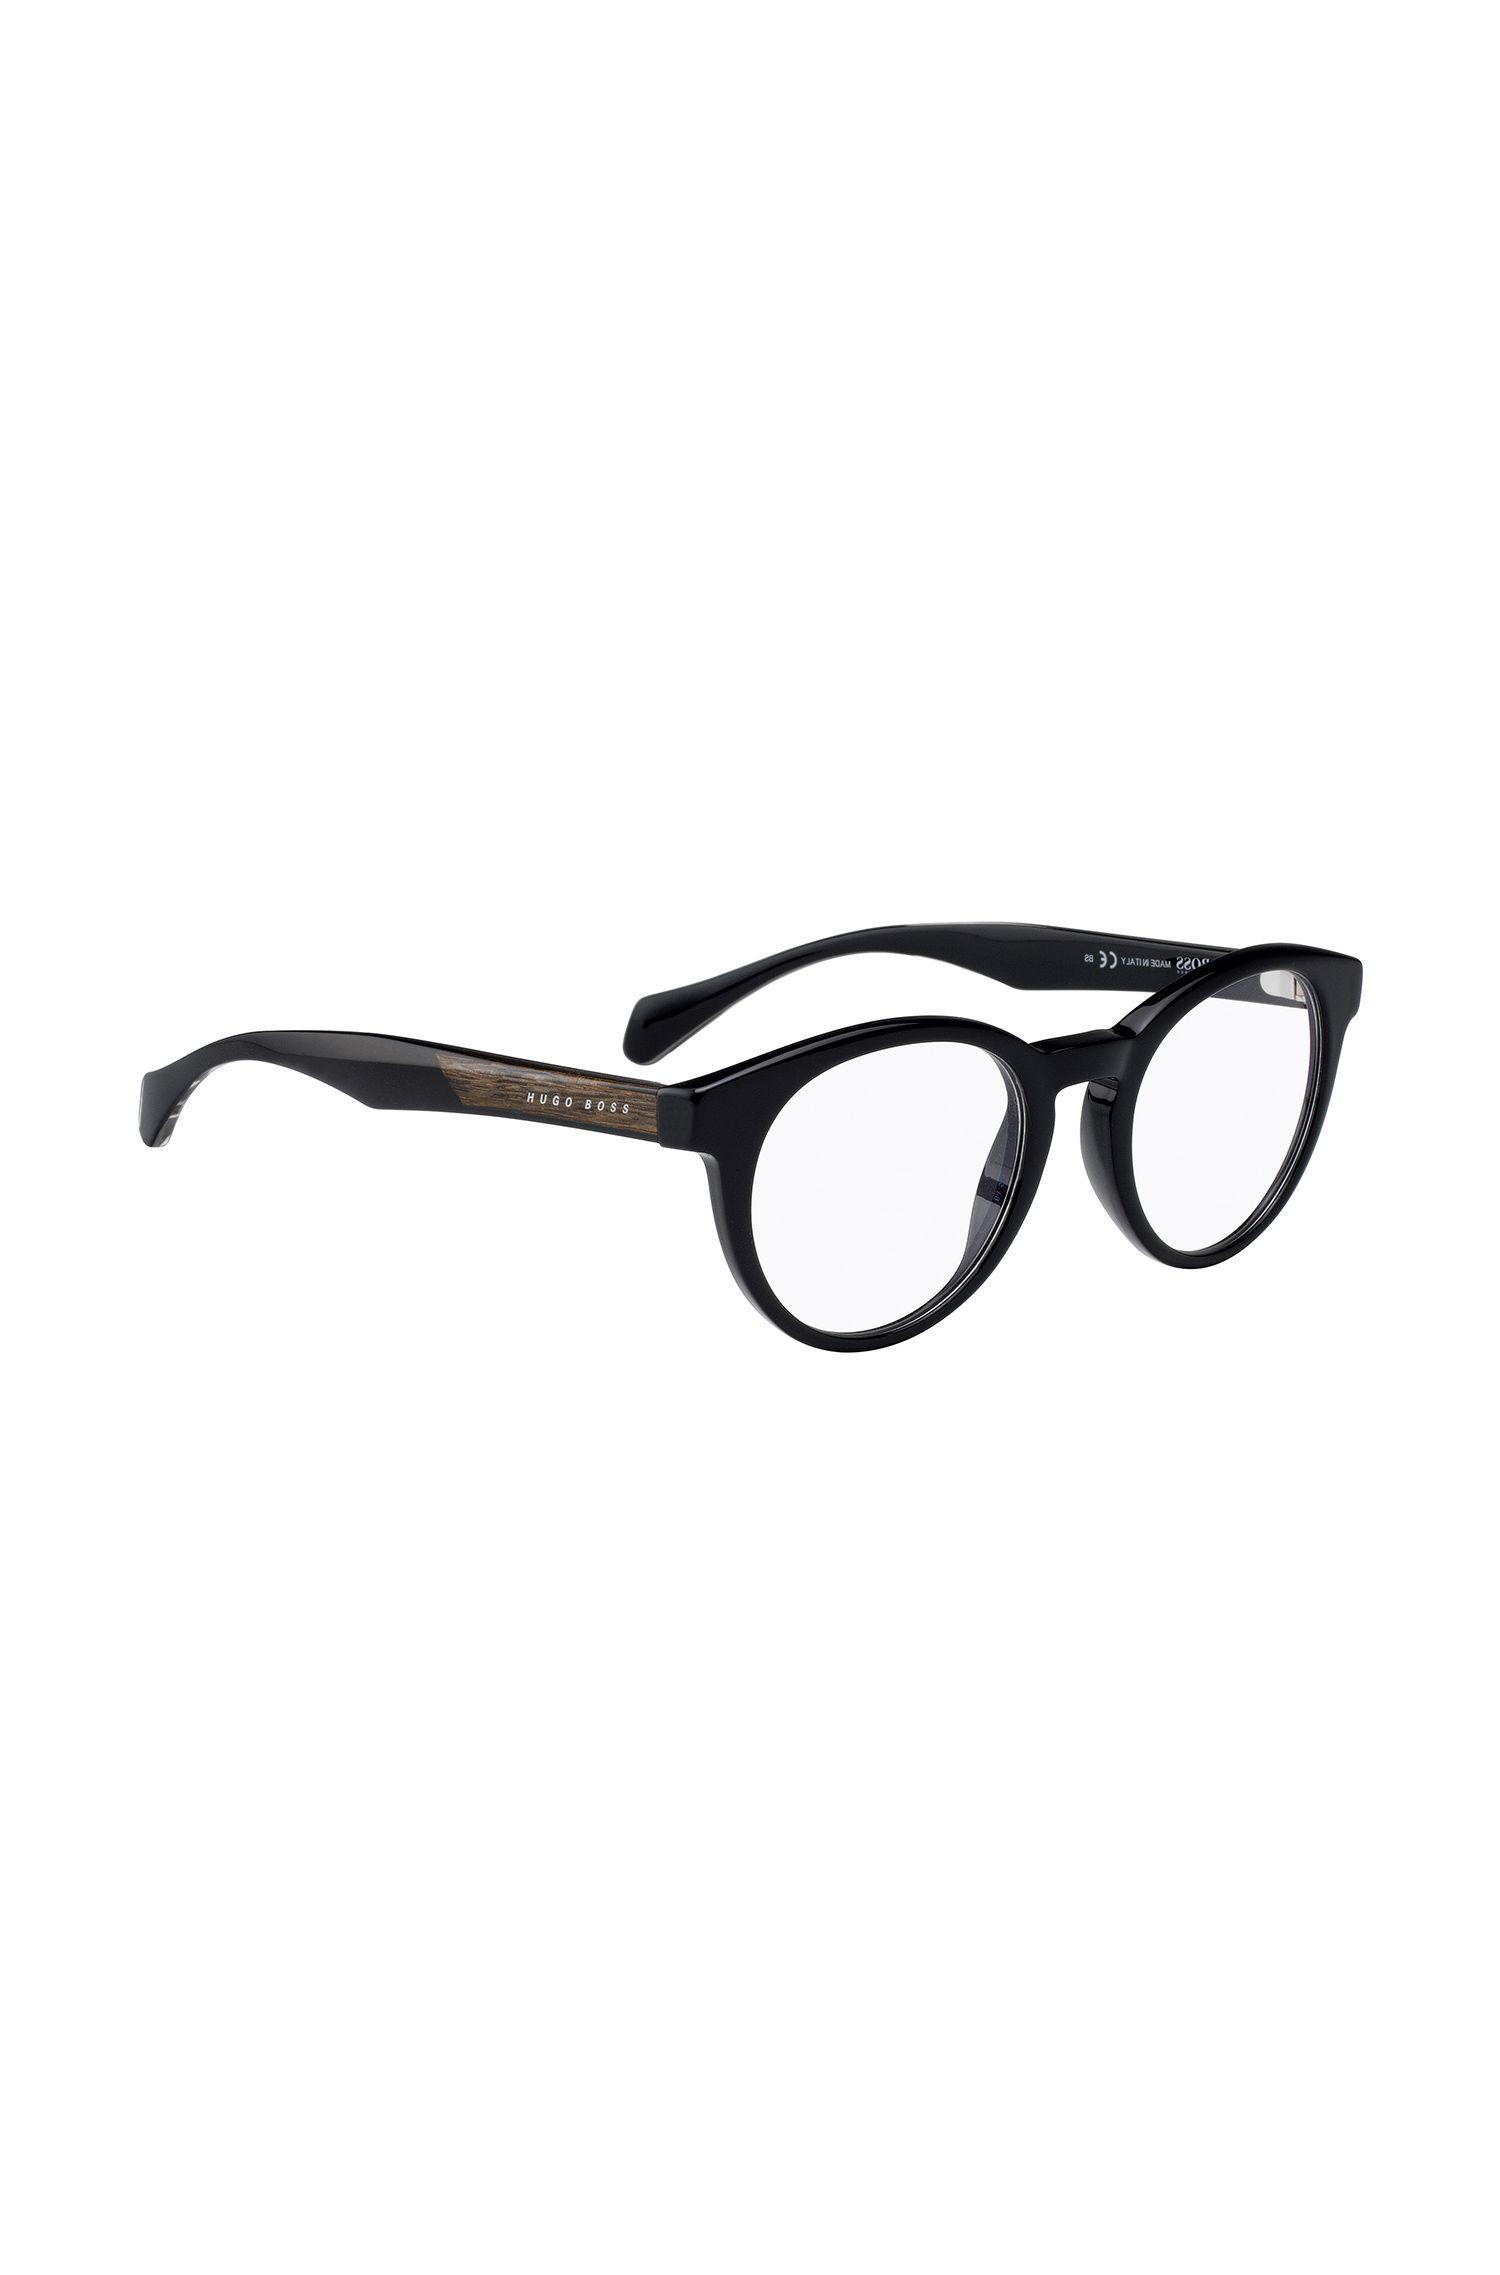 'BOSS 0913 1YS' | Black Acetate Round Optical Frames